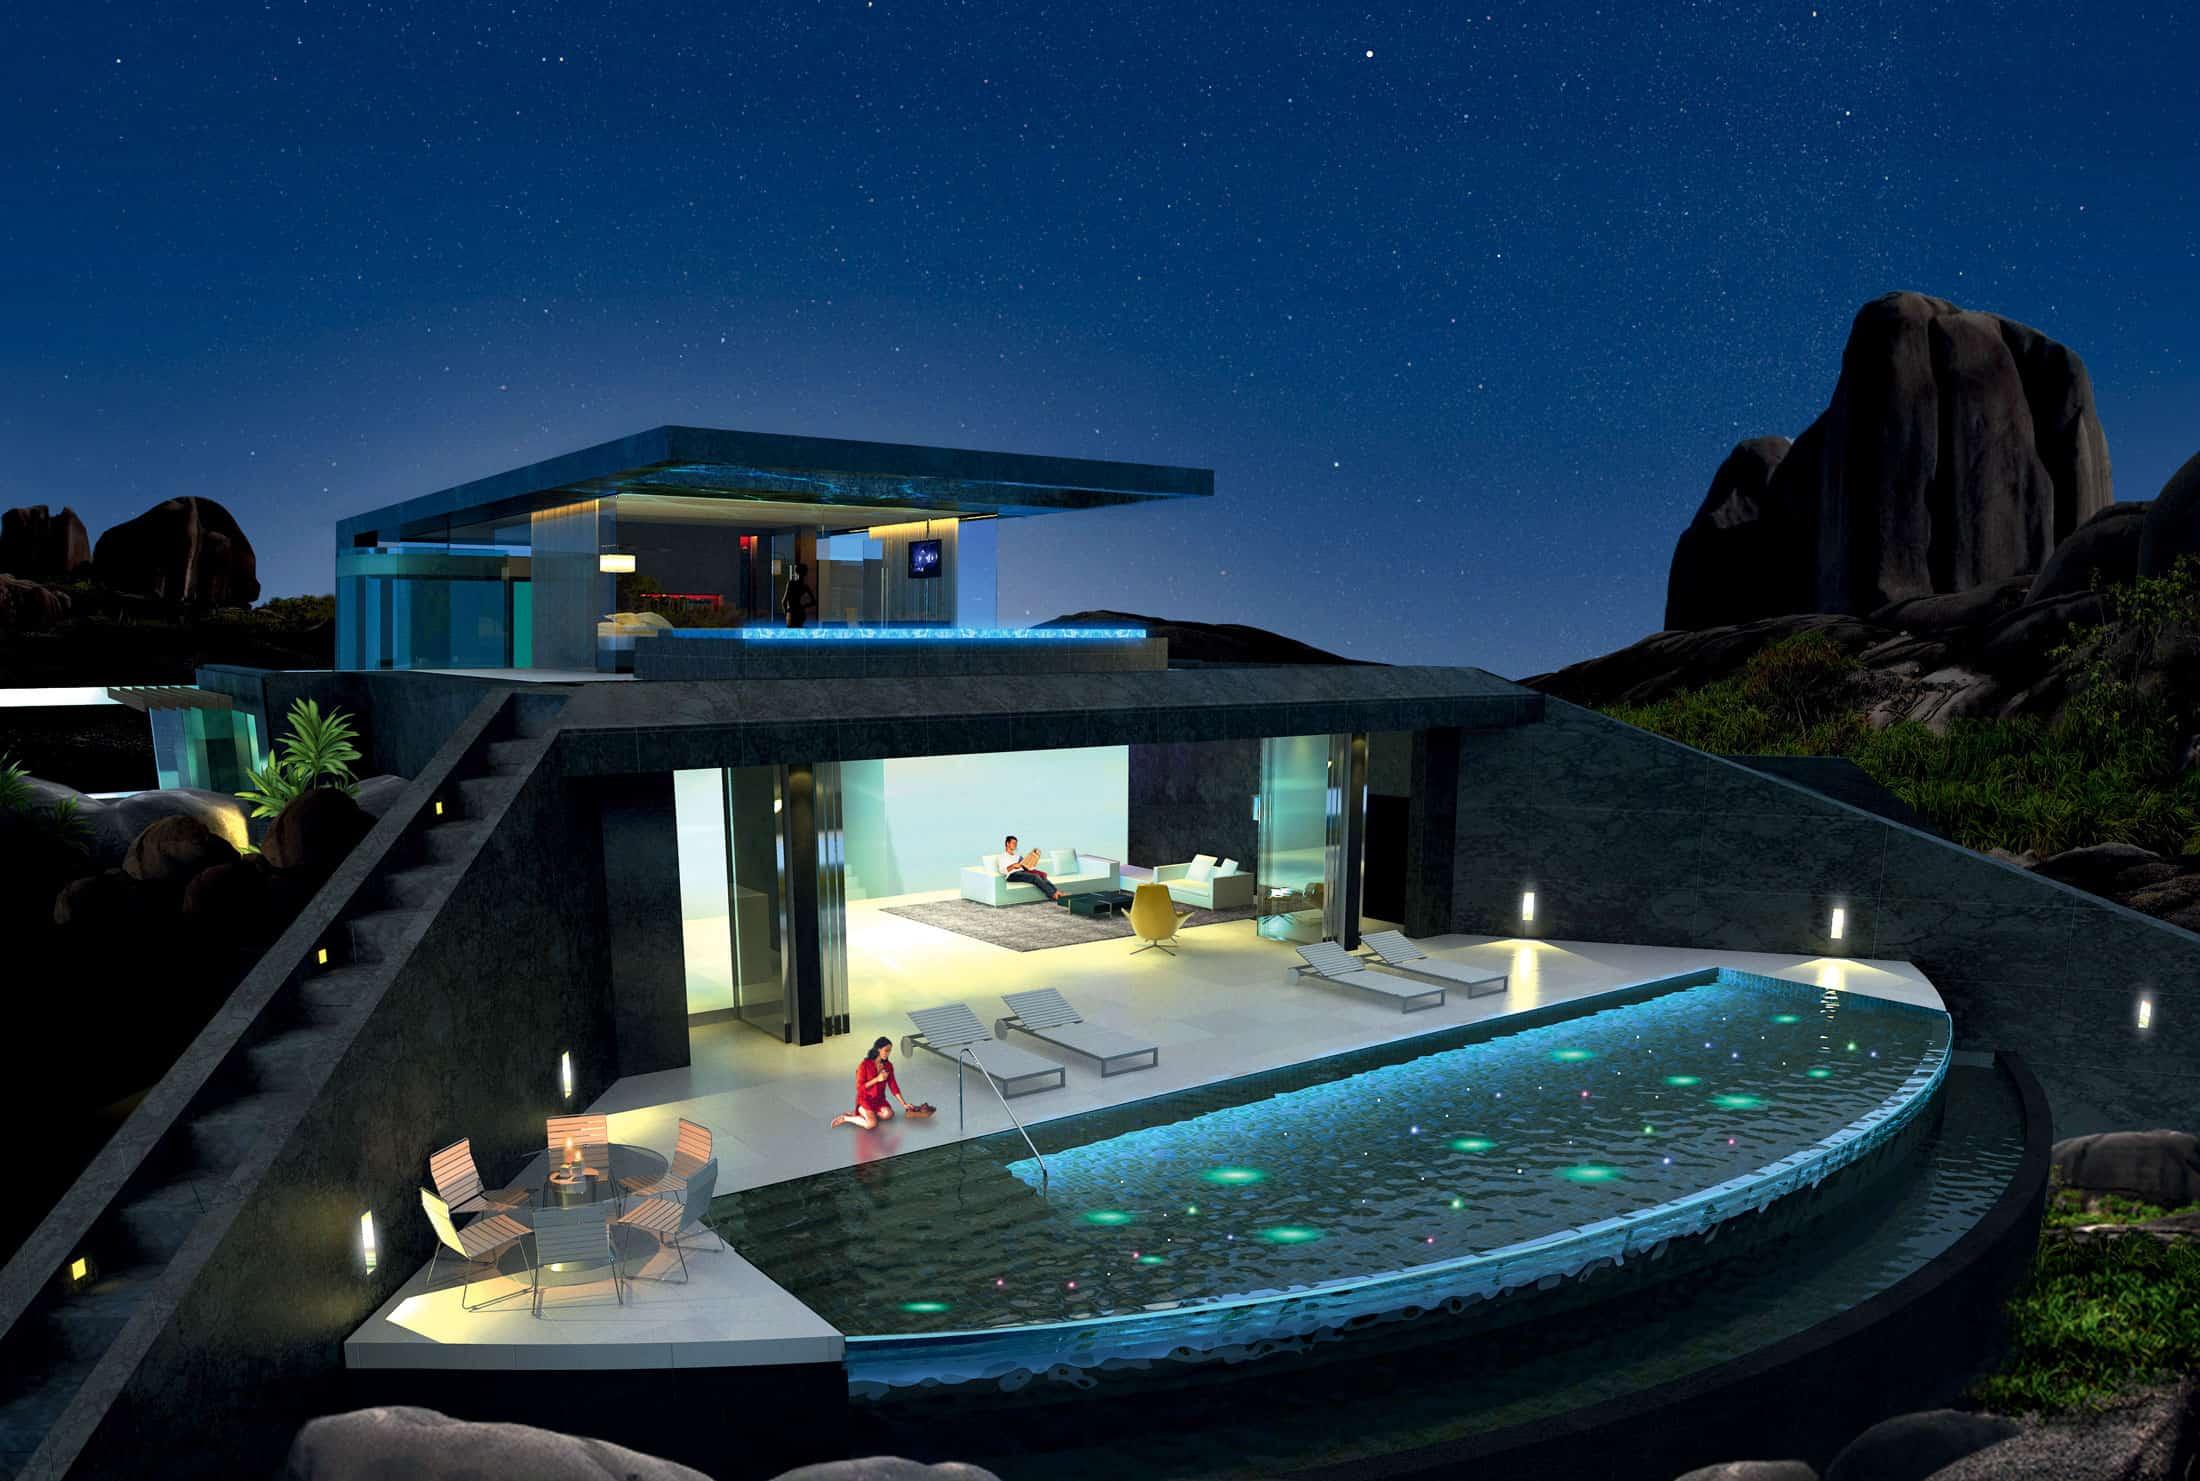 home infinity pool glass bottomed pool rendered social house floor plans pool house floor plans indoor pool